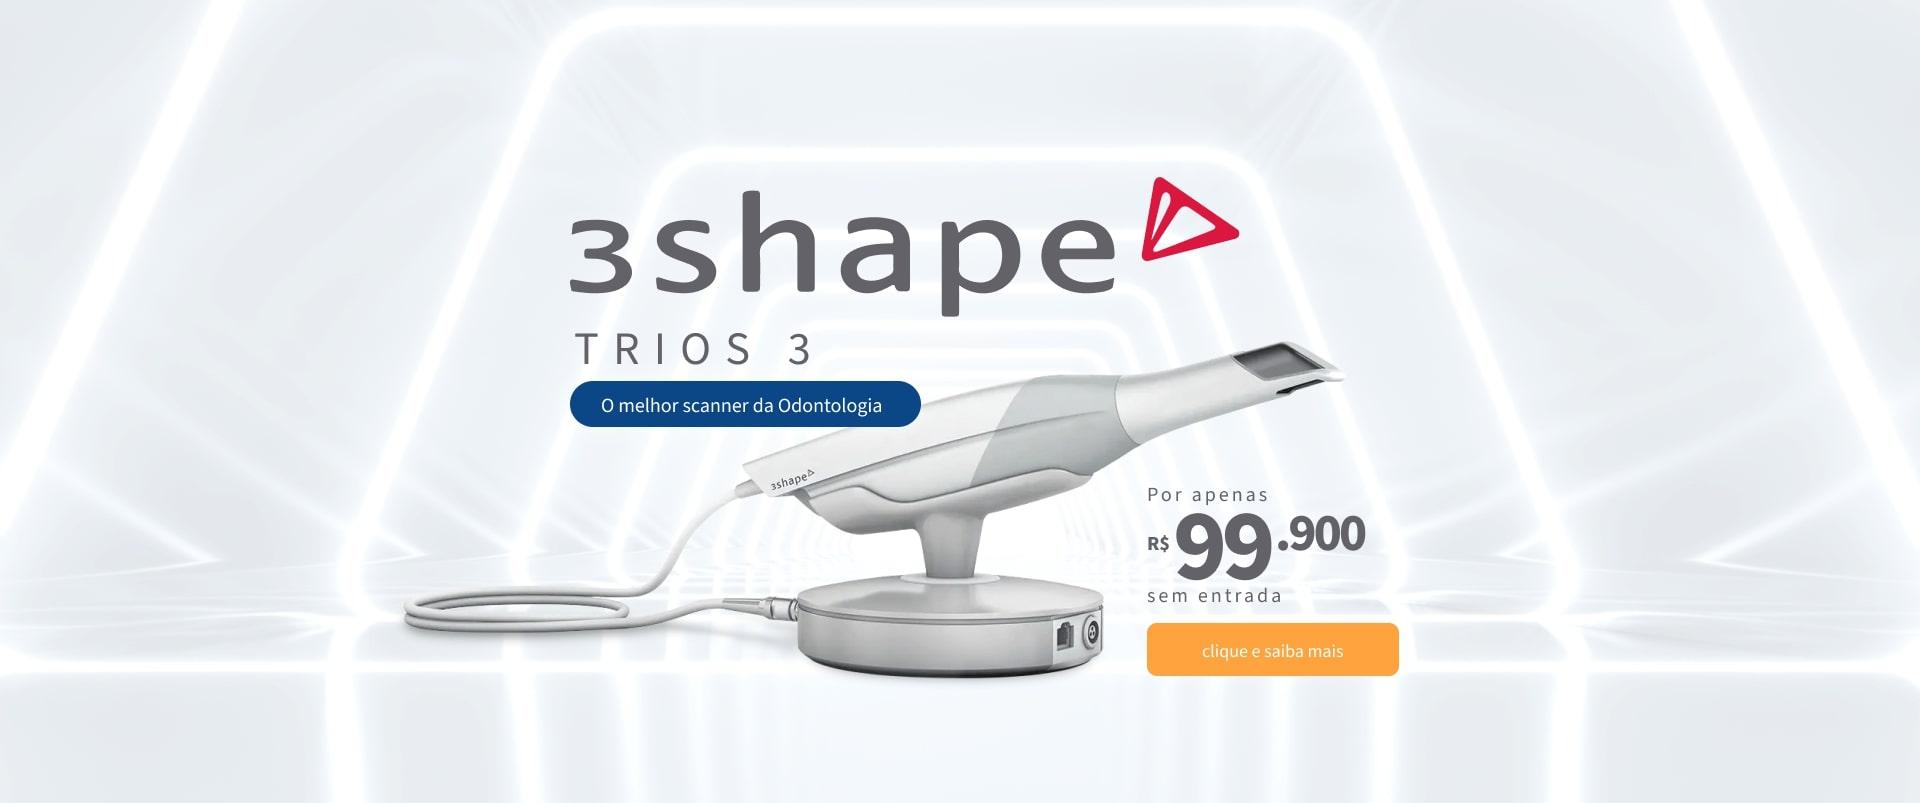 3shape Trios3